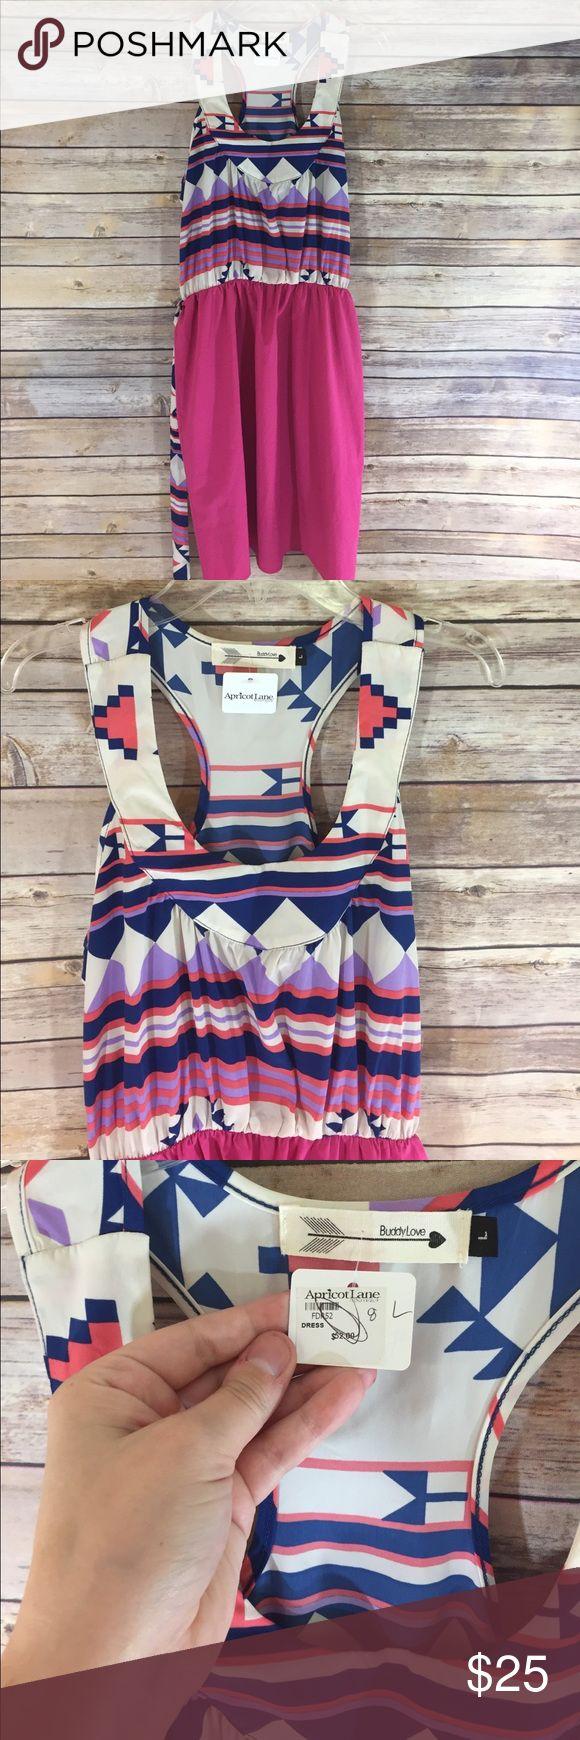 Apricot Lane Silky Pink and Tribal Print Dress Apricot Lane Silky Pink and Tribal Print Dress. Size large. NWT apricot lane Dresses